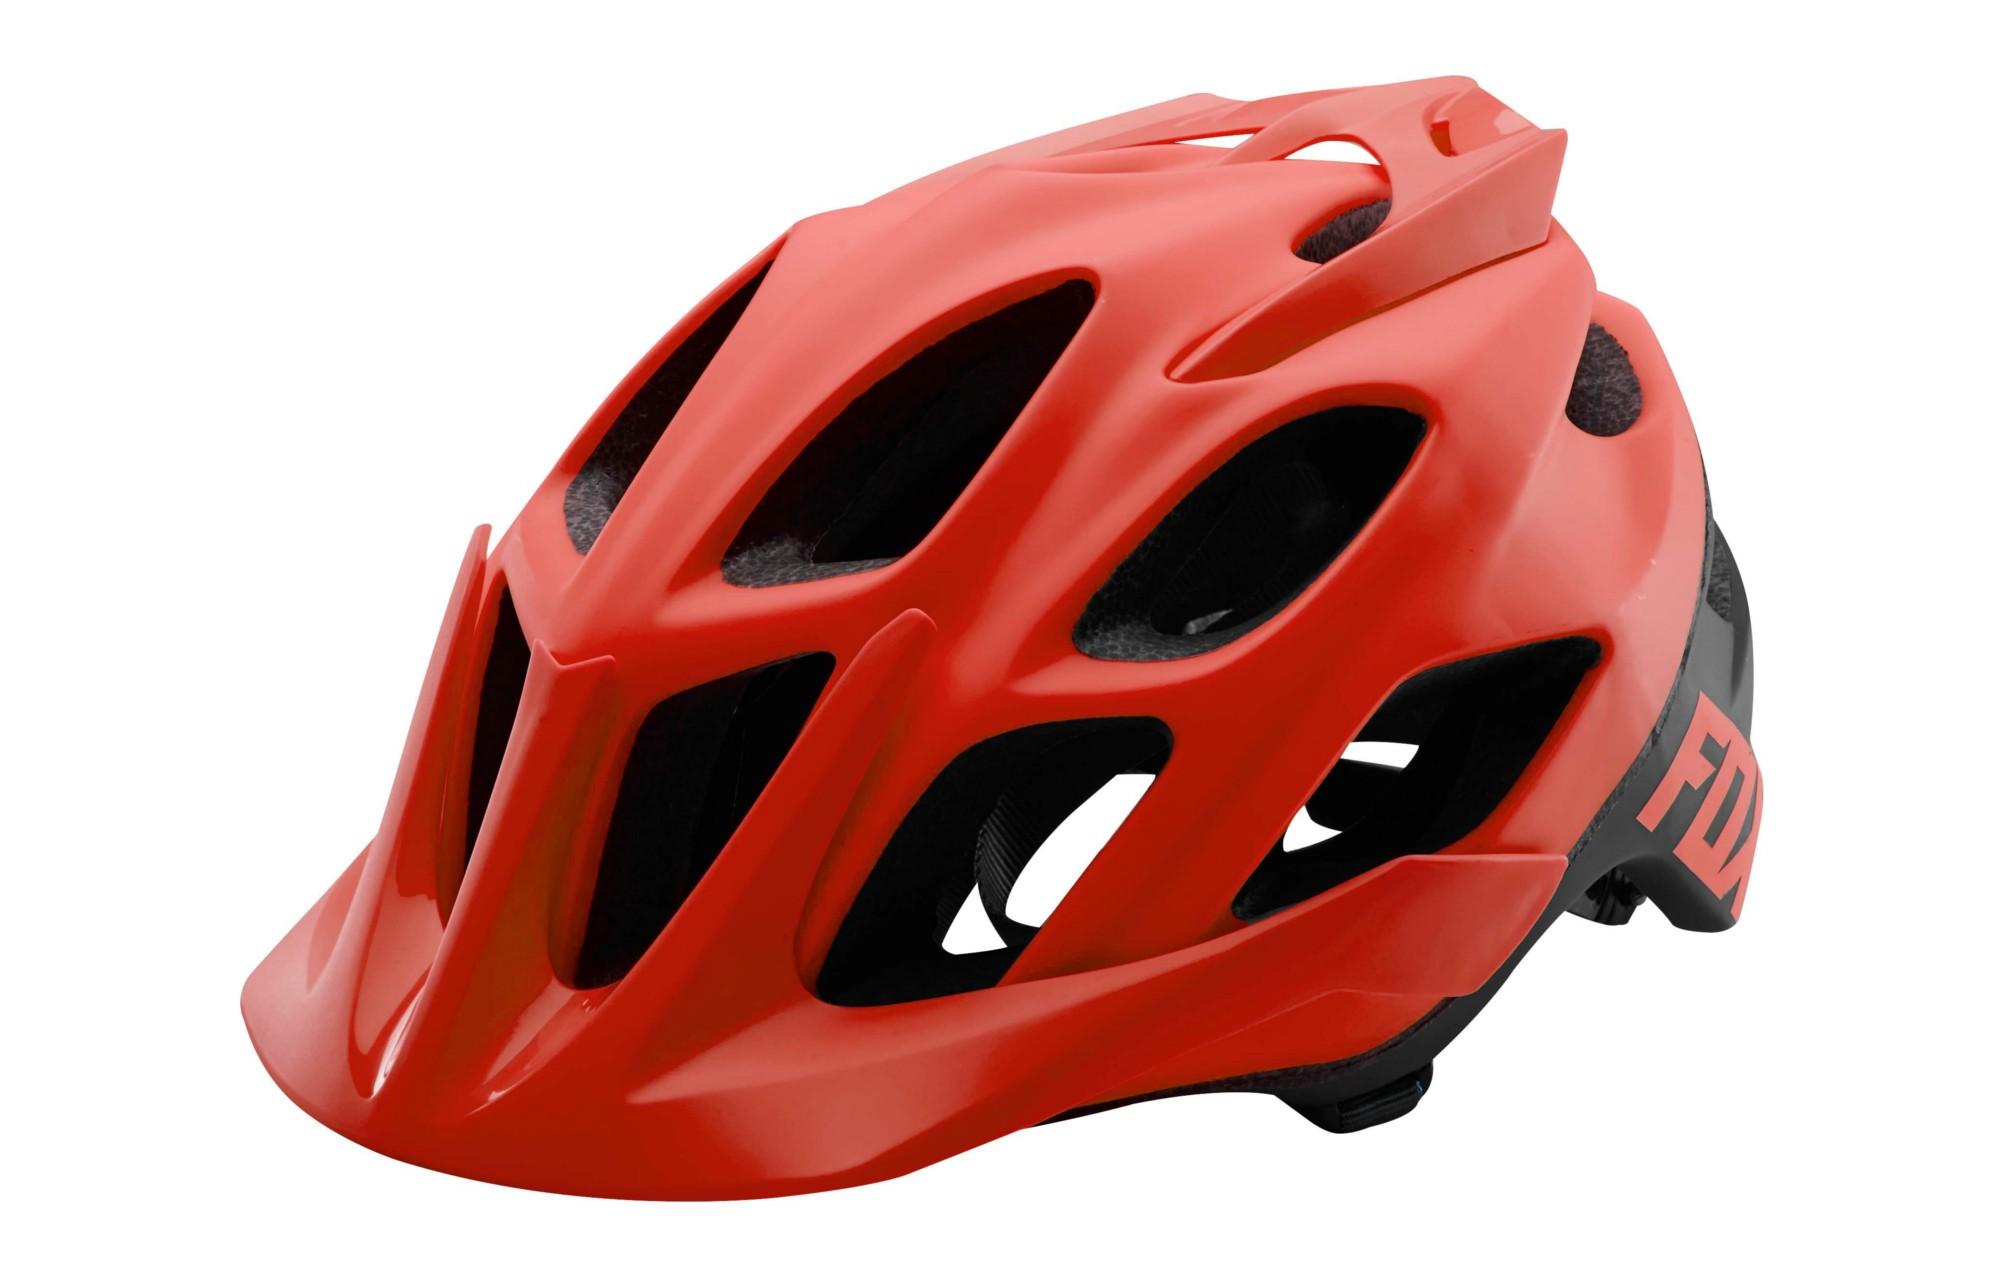 casco fox flux (bici) orange S/M